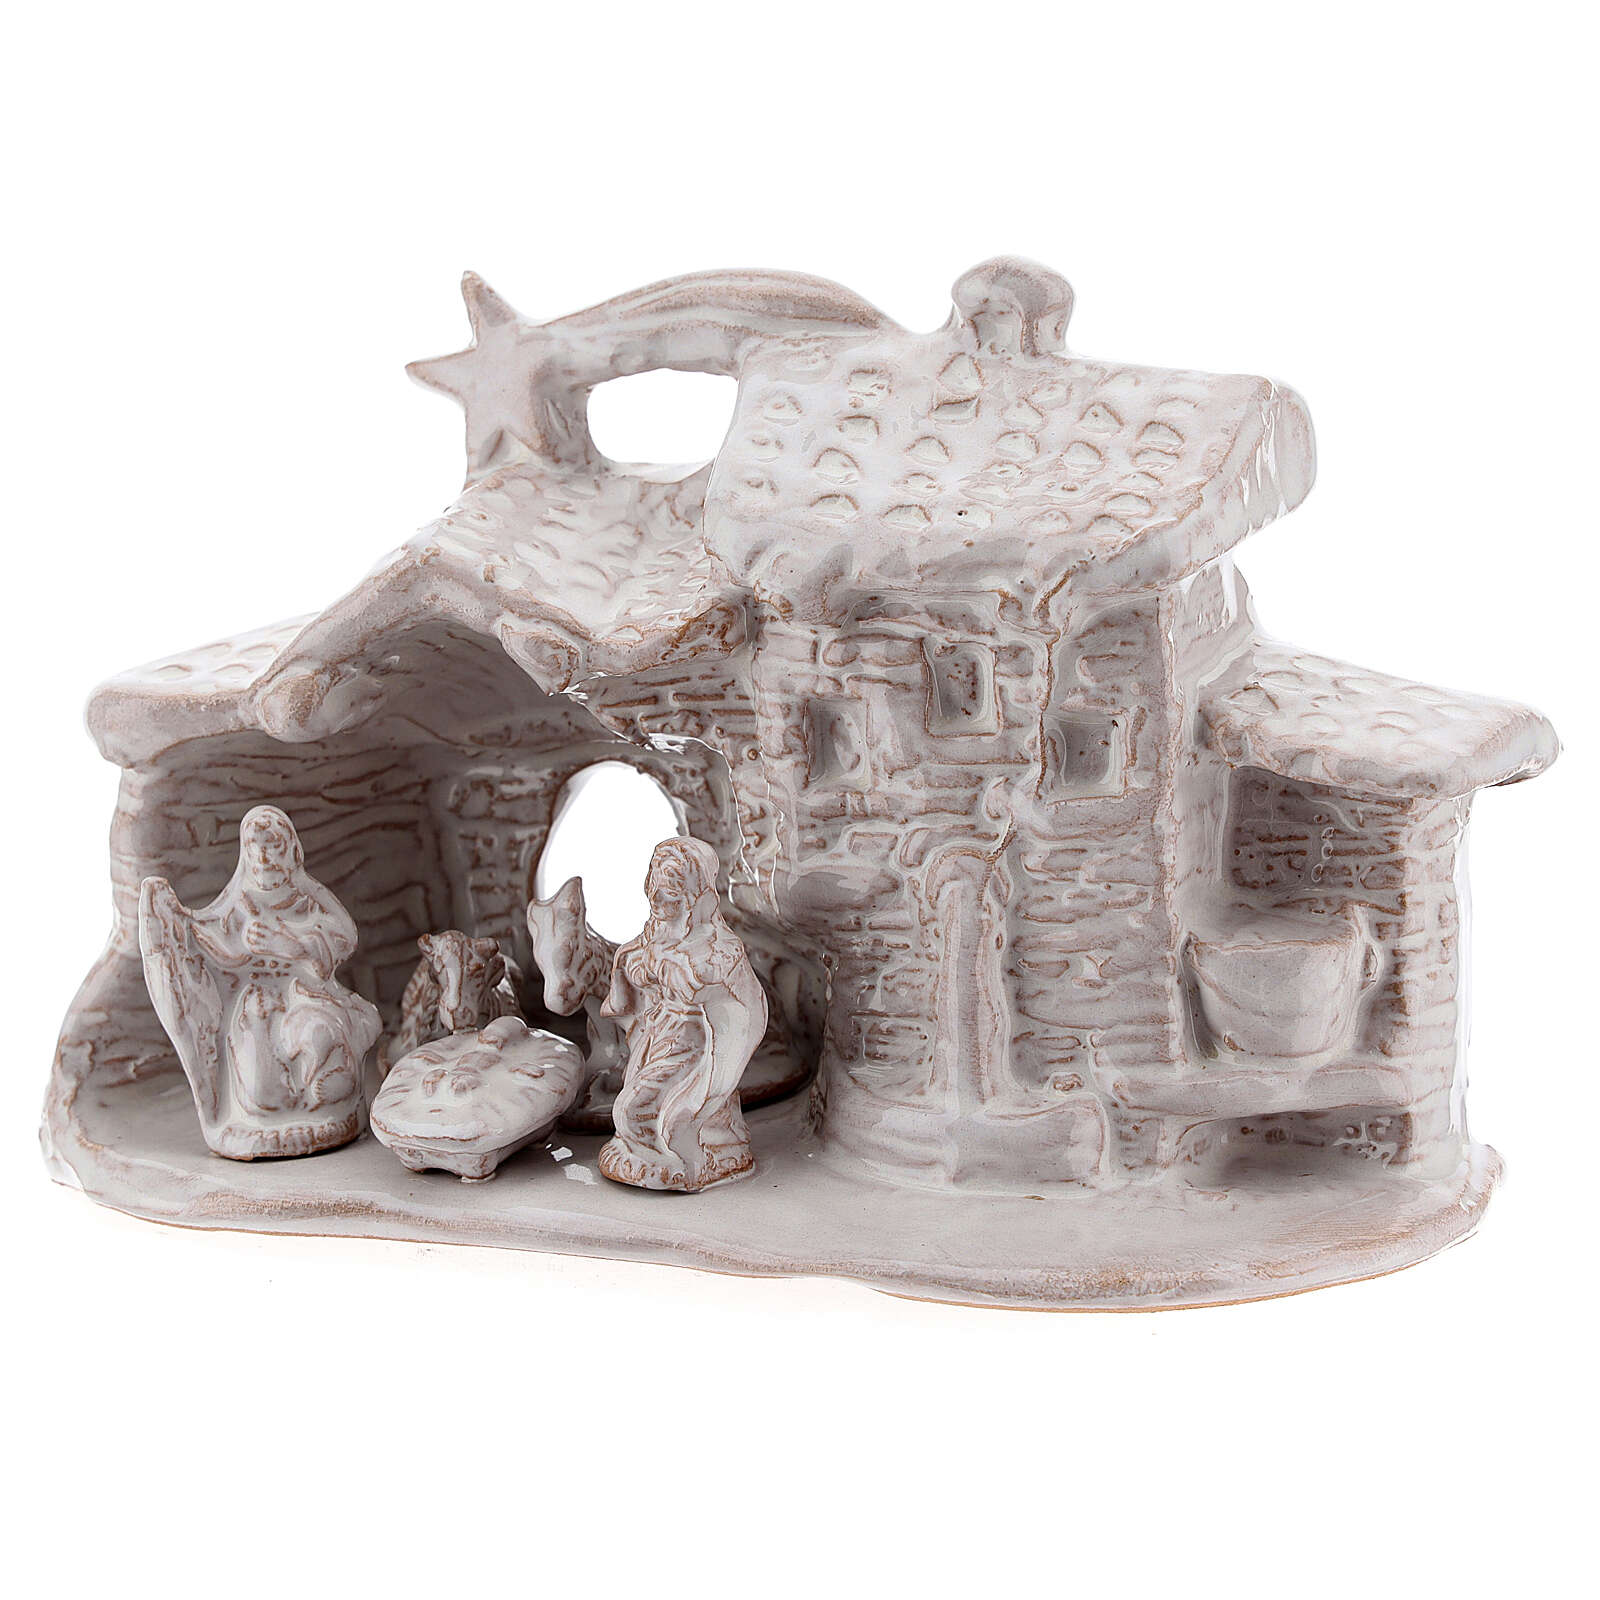 Stable village Nativity scene white Deruta terracotta 10 cm 4